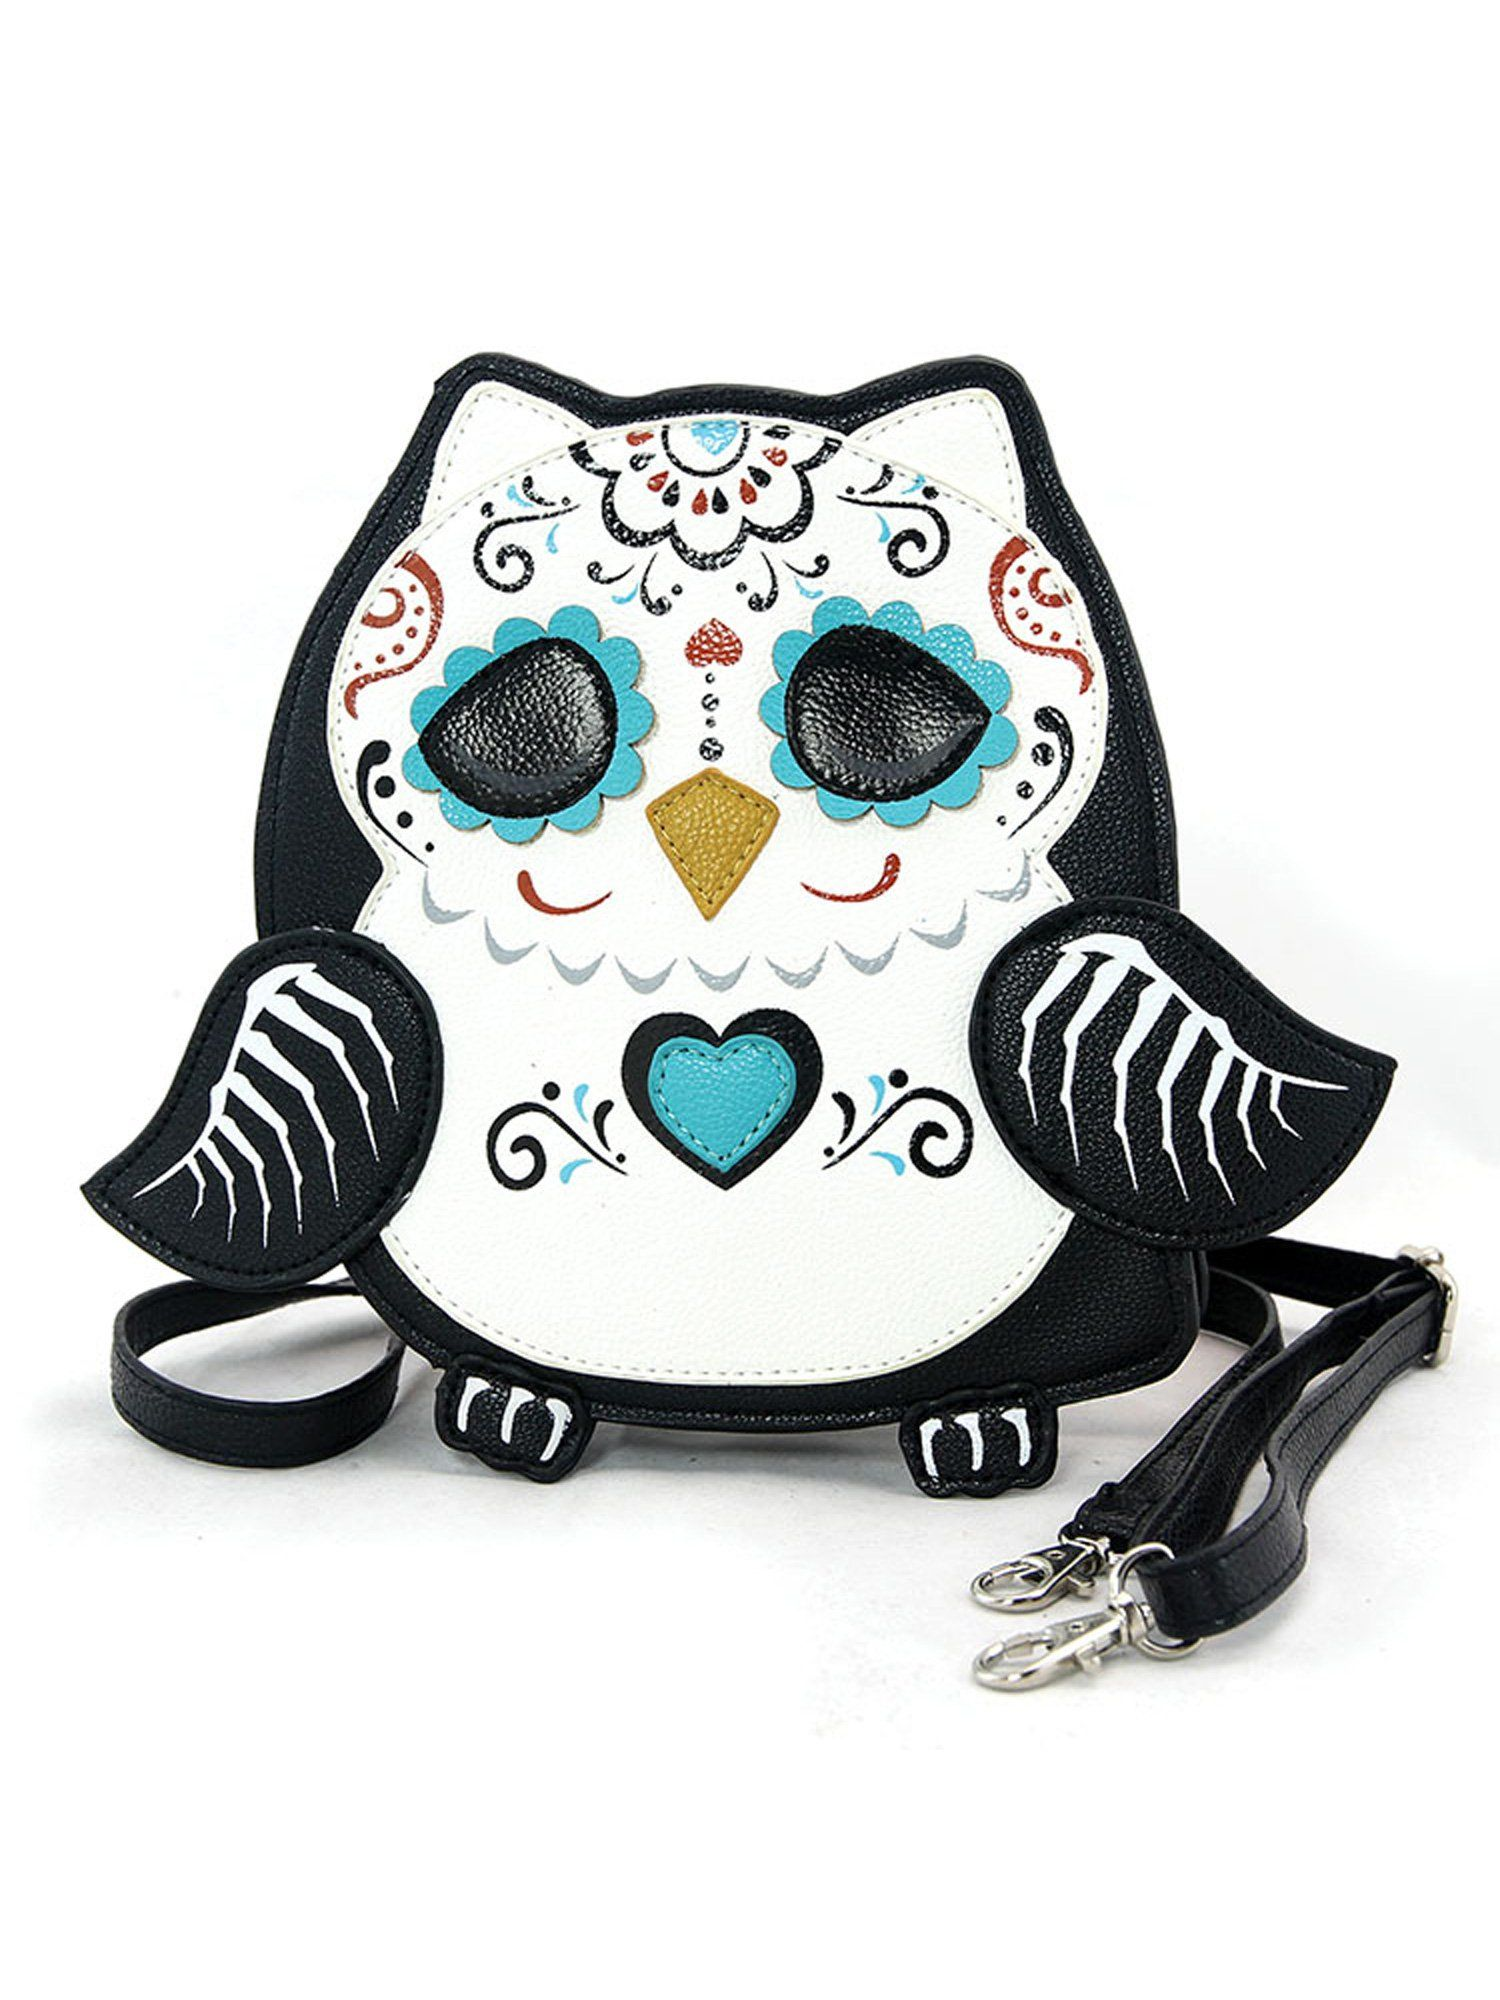 e7f0c6fa5 Sleepyville Critters Sugar Owl Sugar Skull Day Crossbody Bag Purse ...